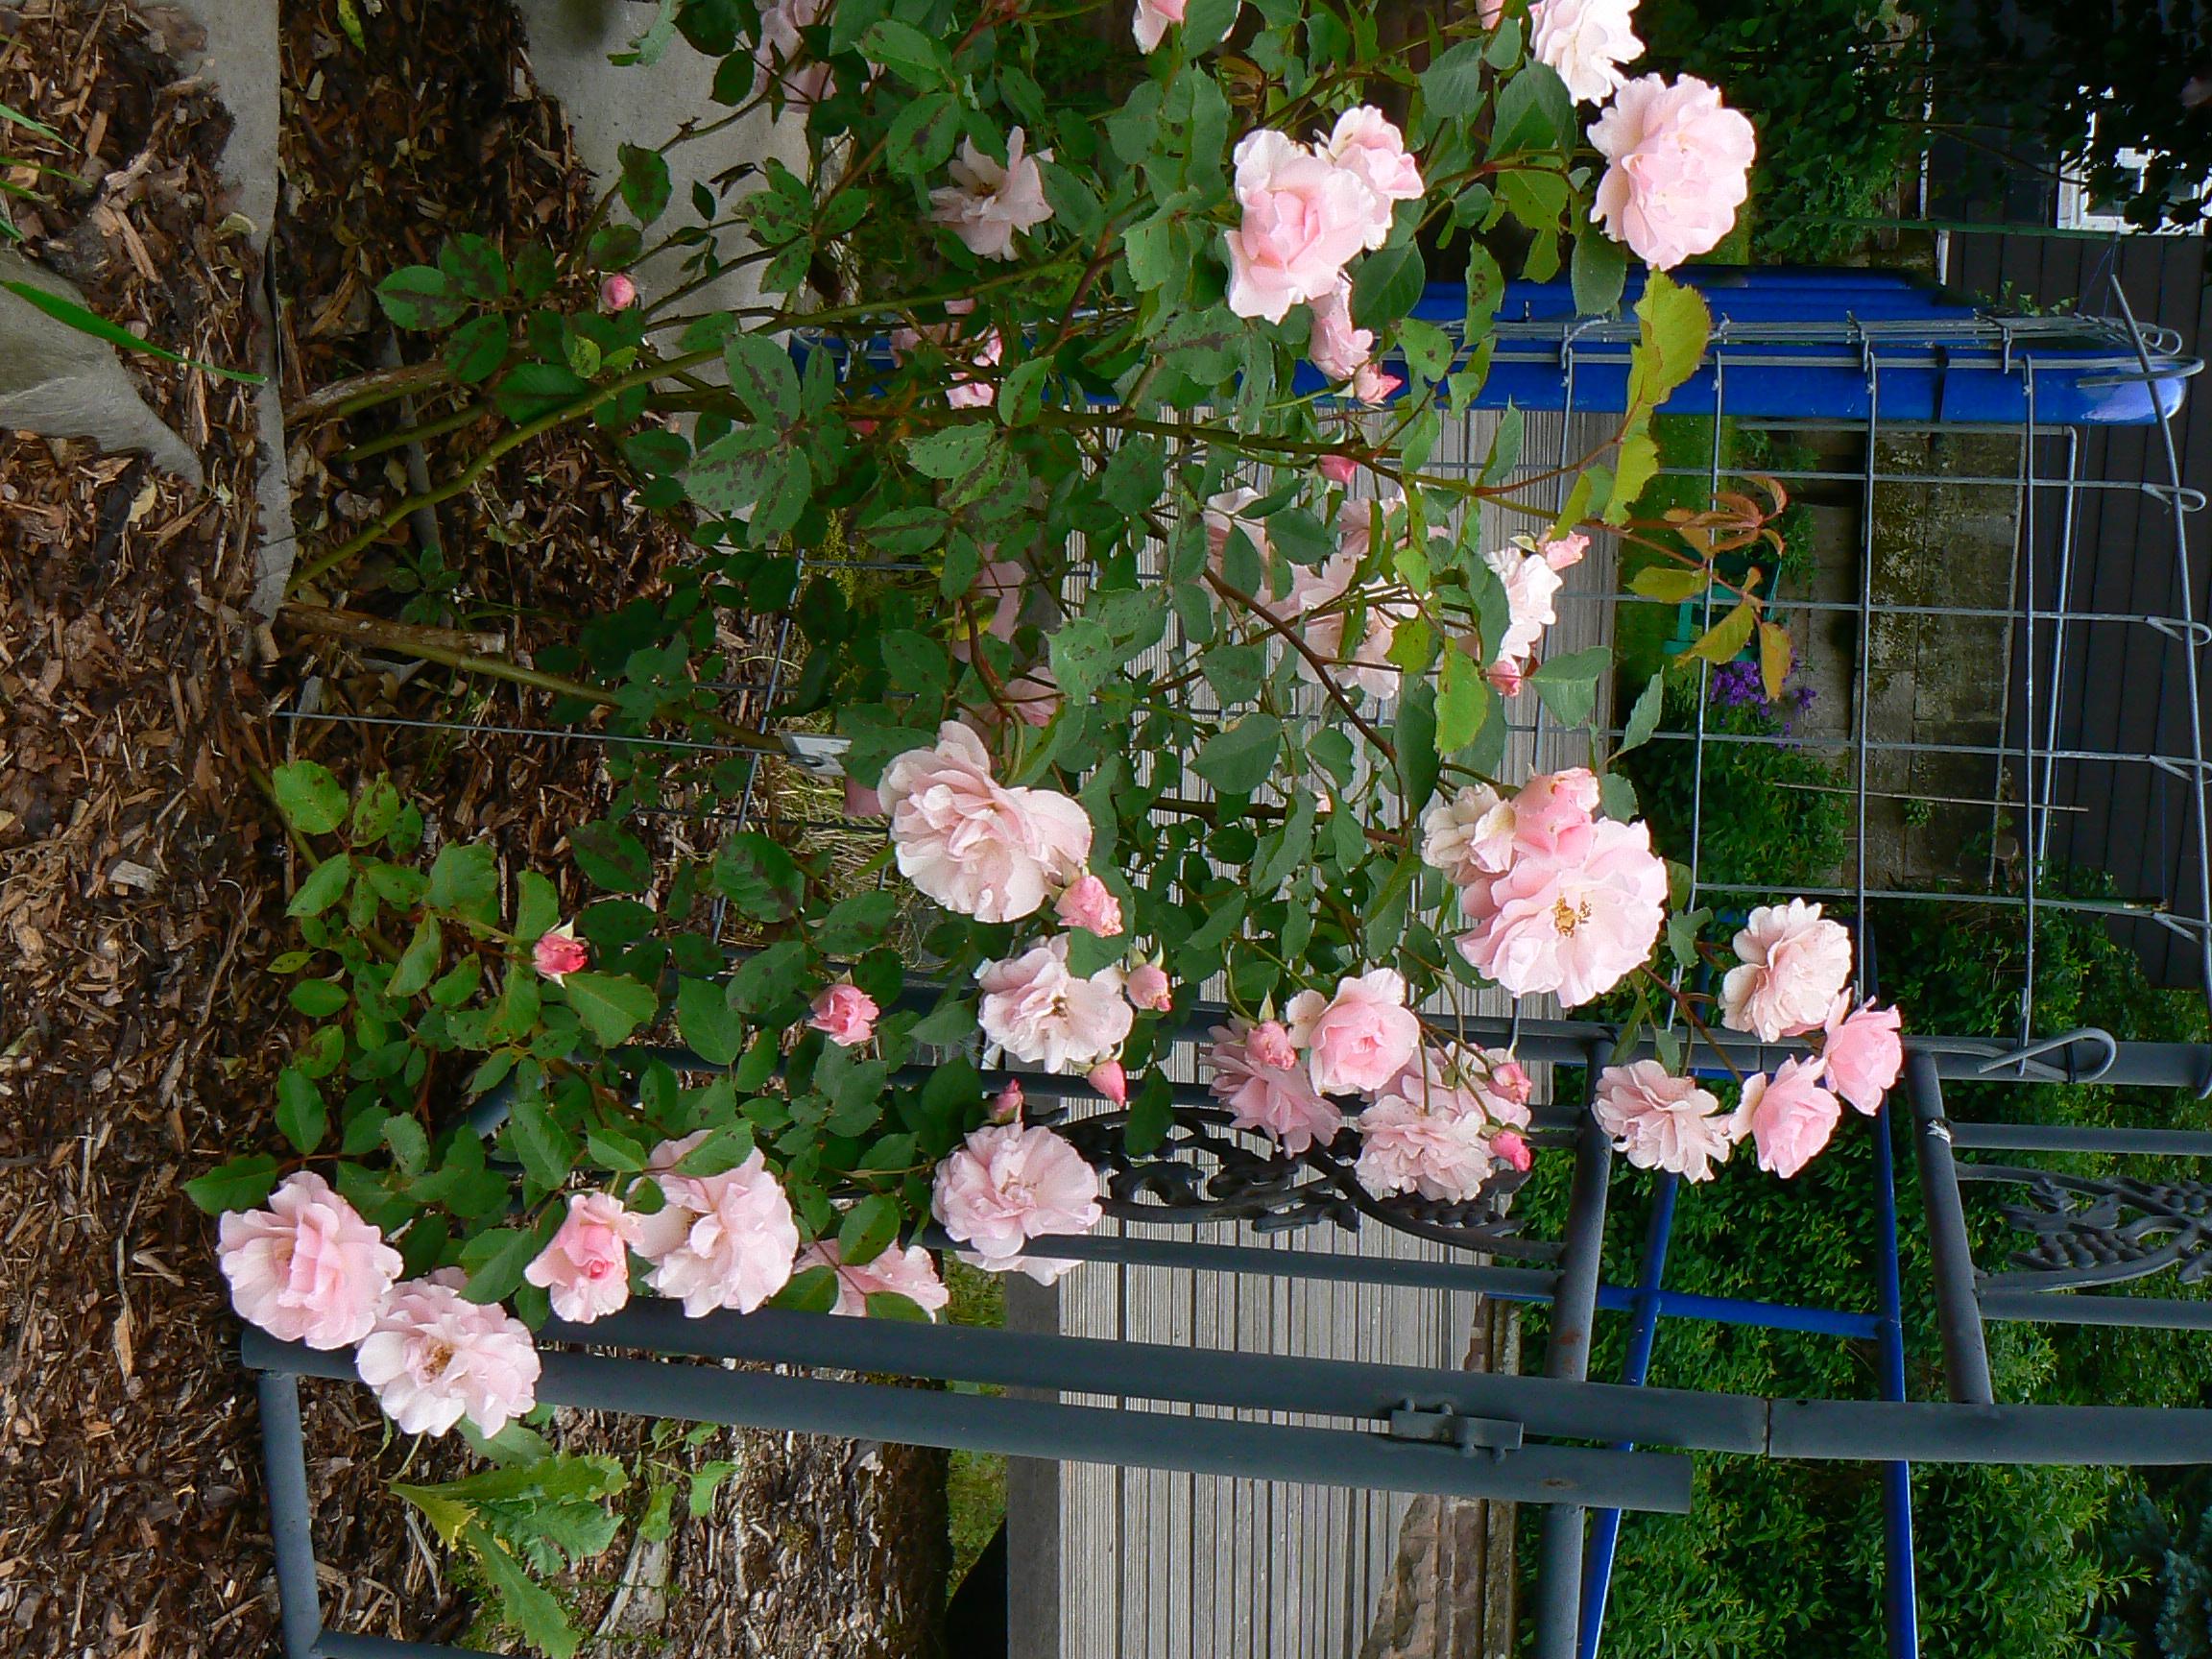 Klettergerüst Rosen : Johanna röpcke grönloof rosen hemerocallisverkauf